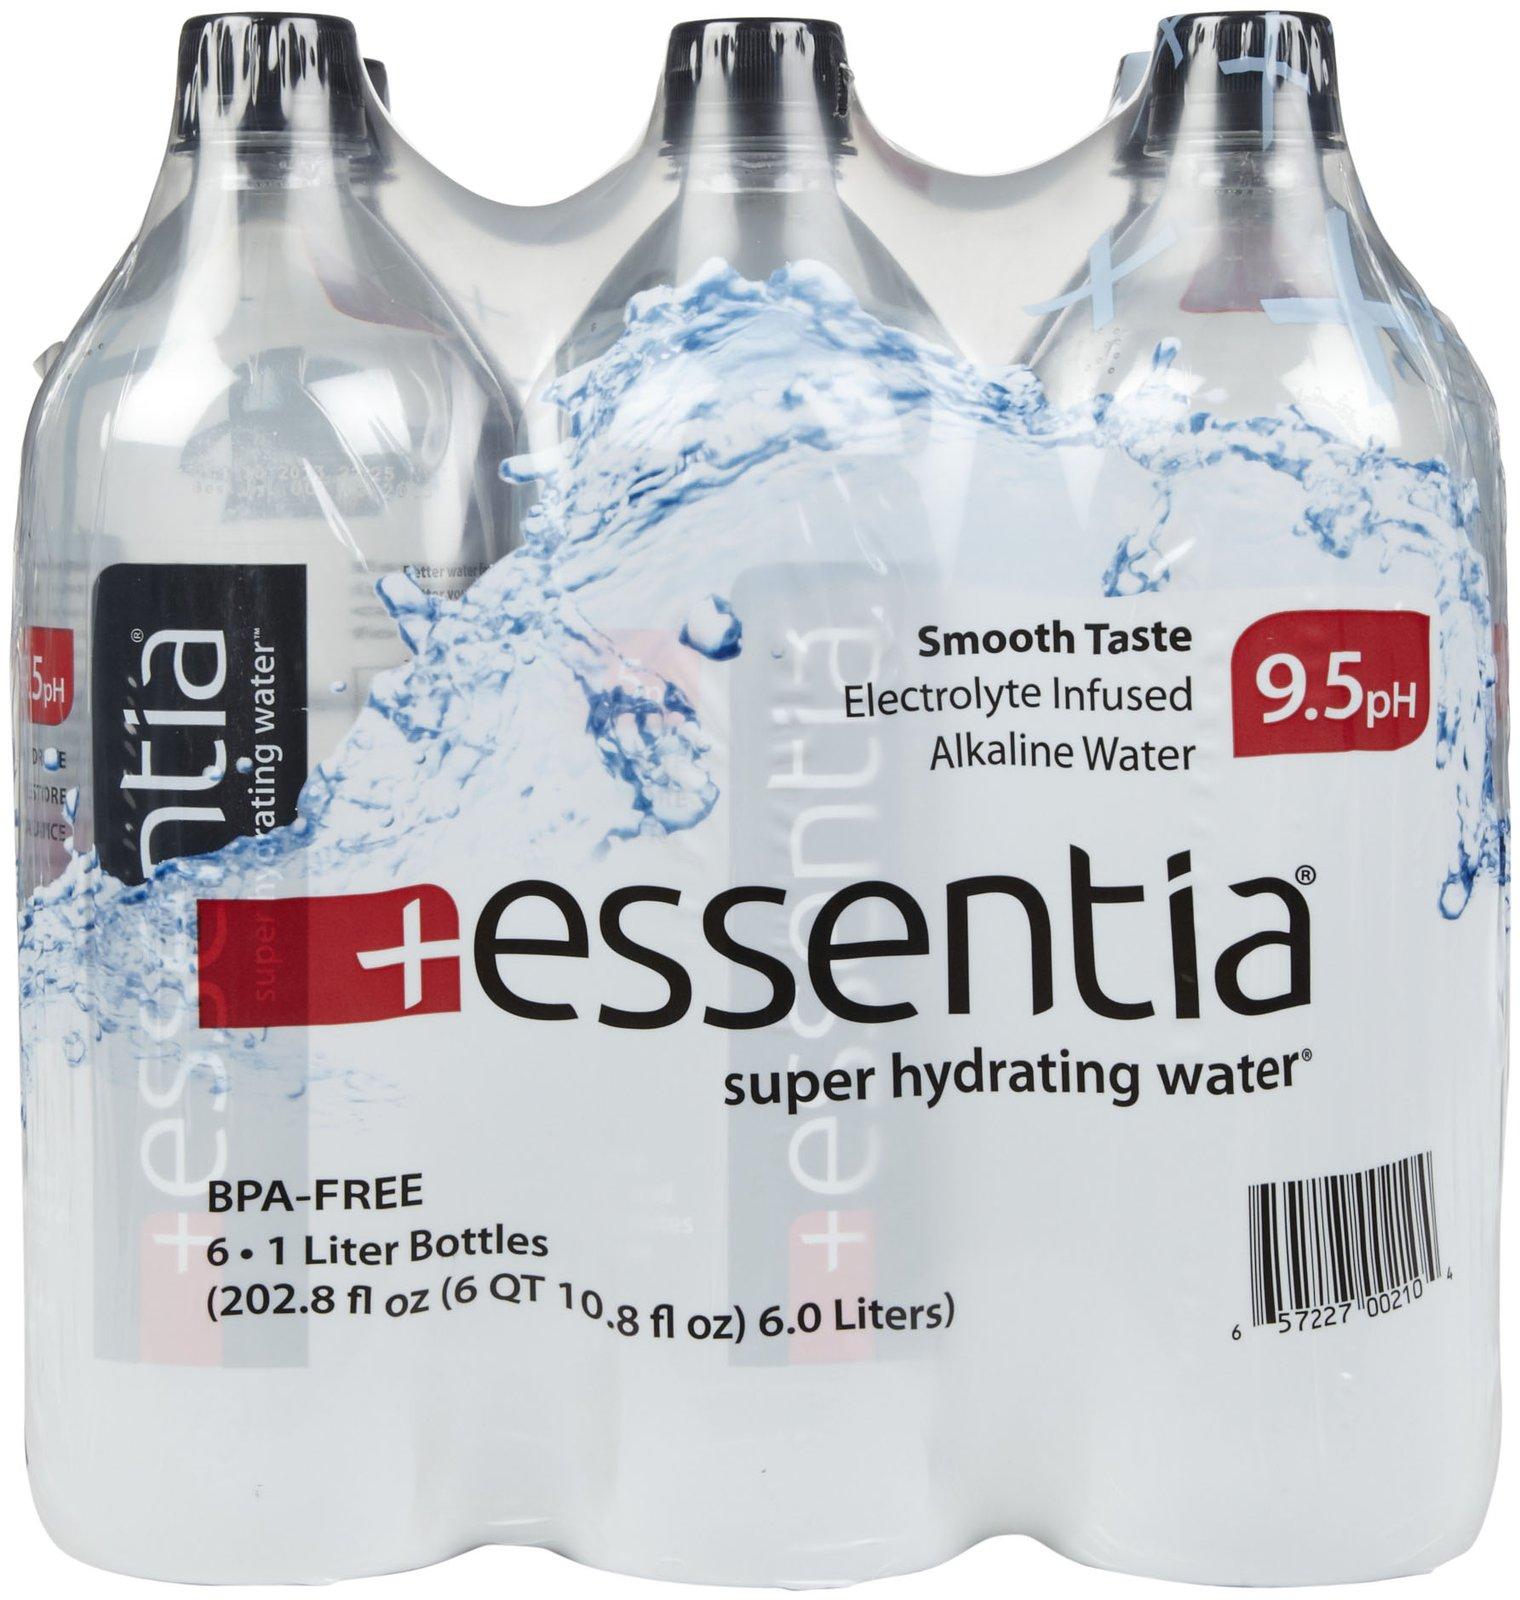 Essentia BG12831 Essentia Essence Water - 2x6Pack